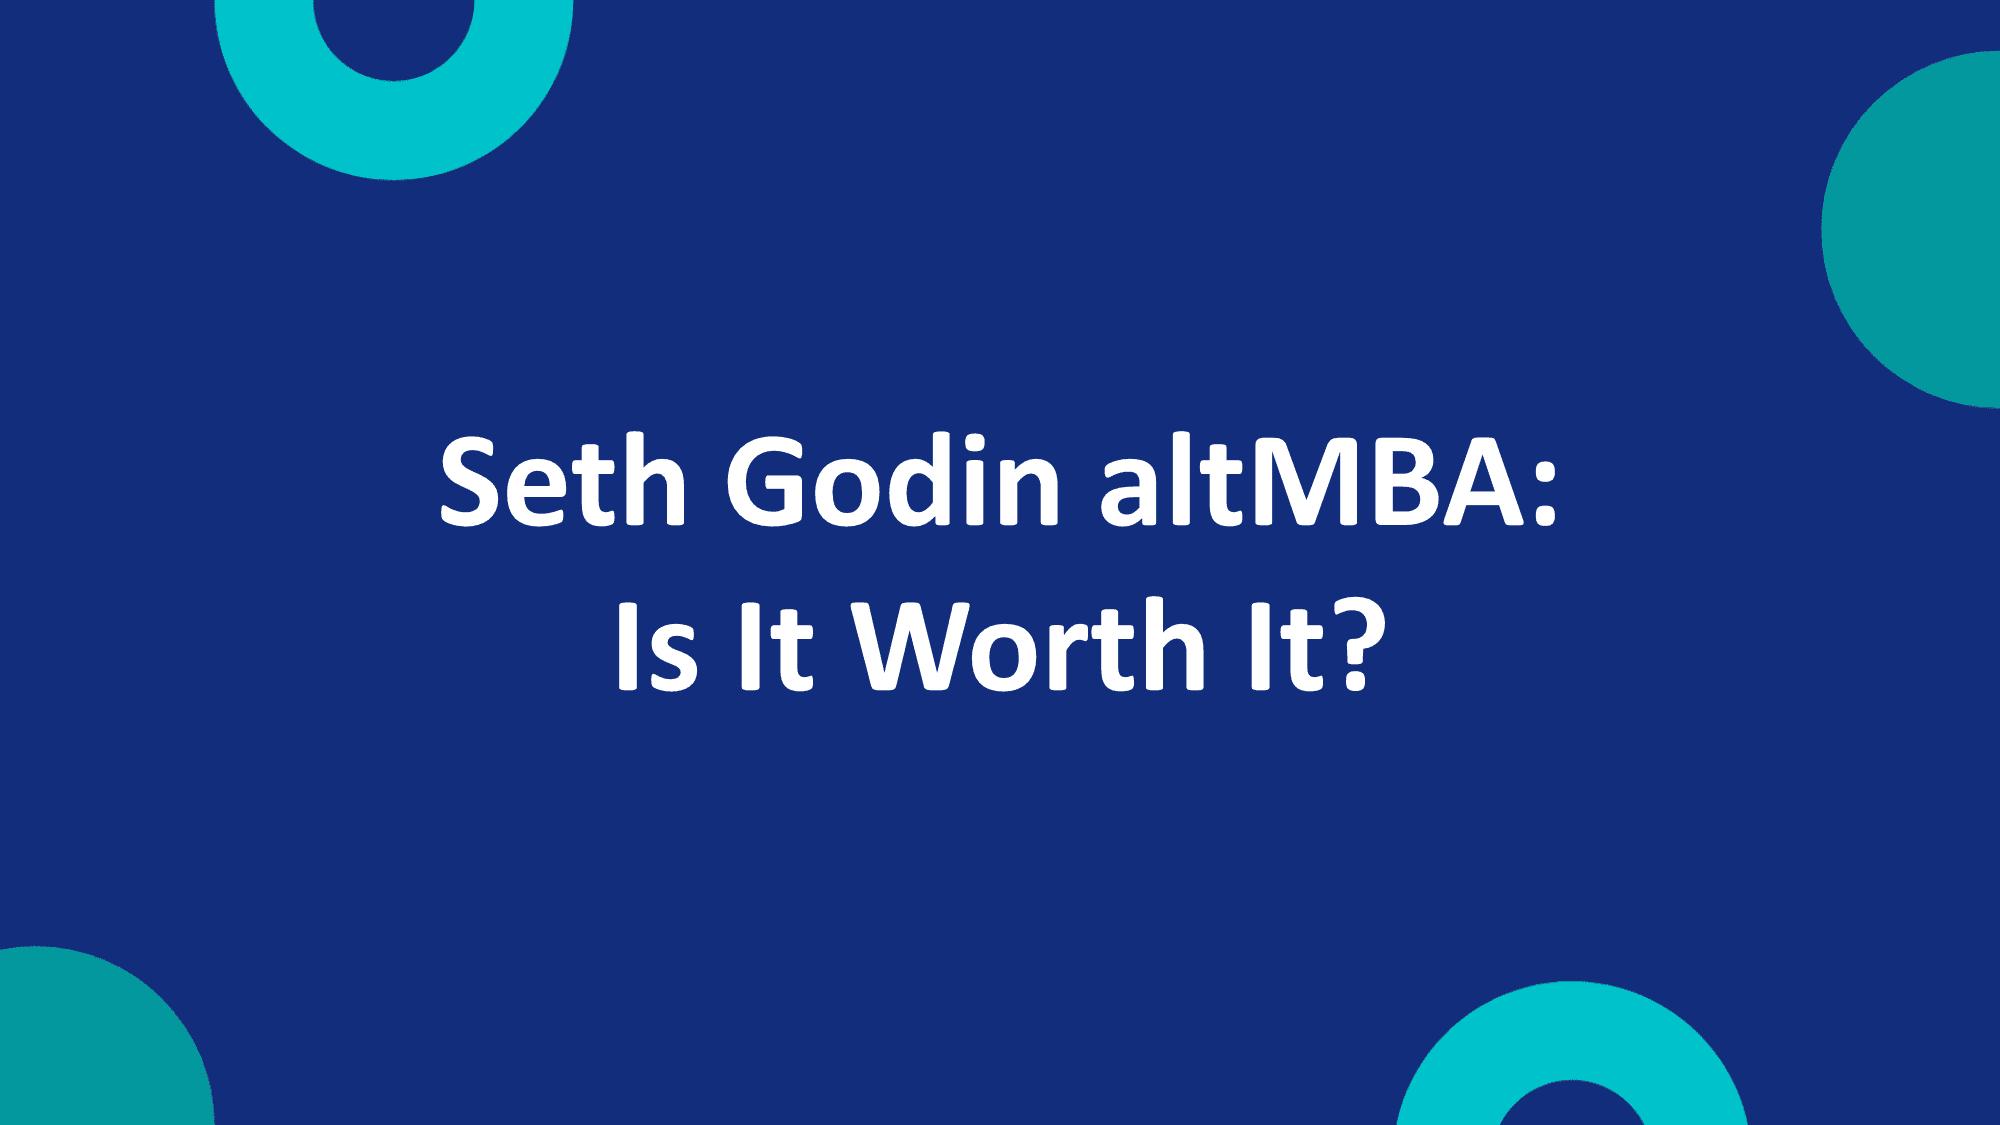 Seth Godin altMBA